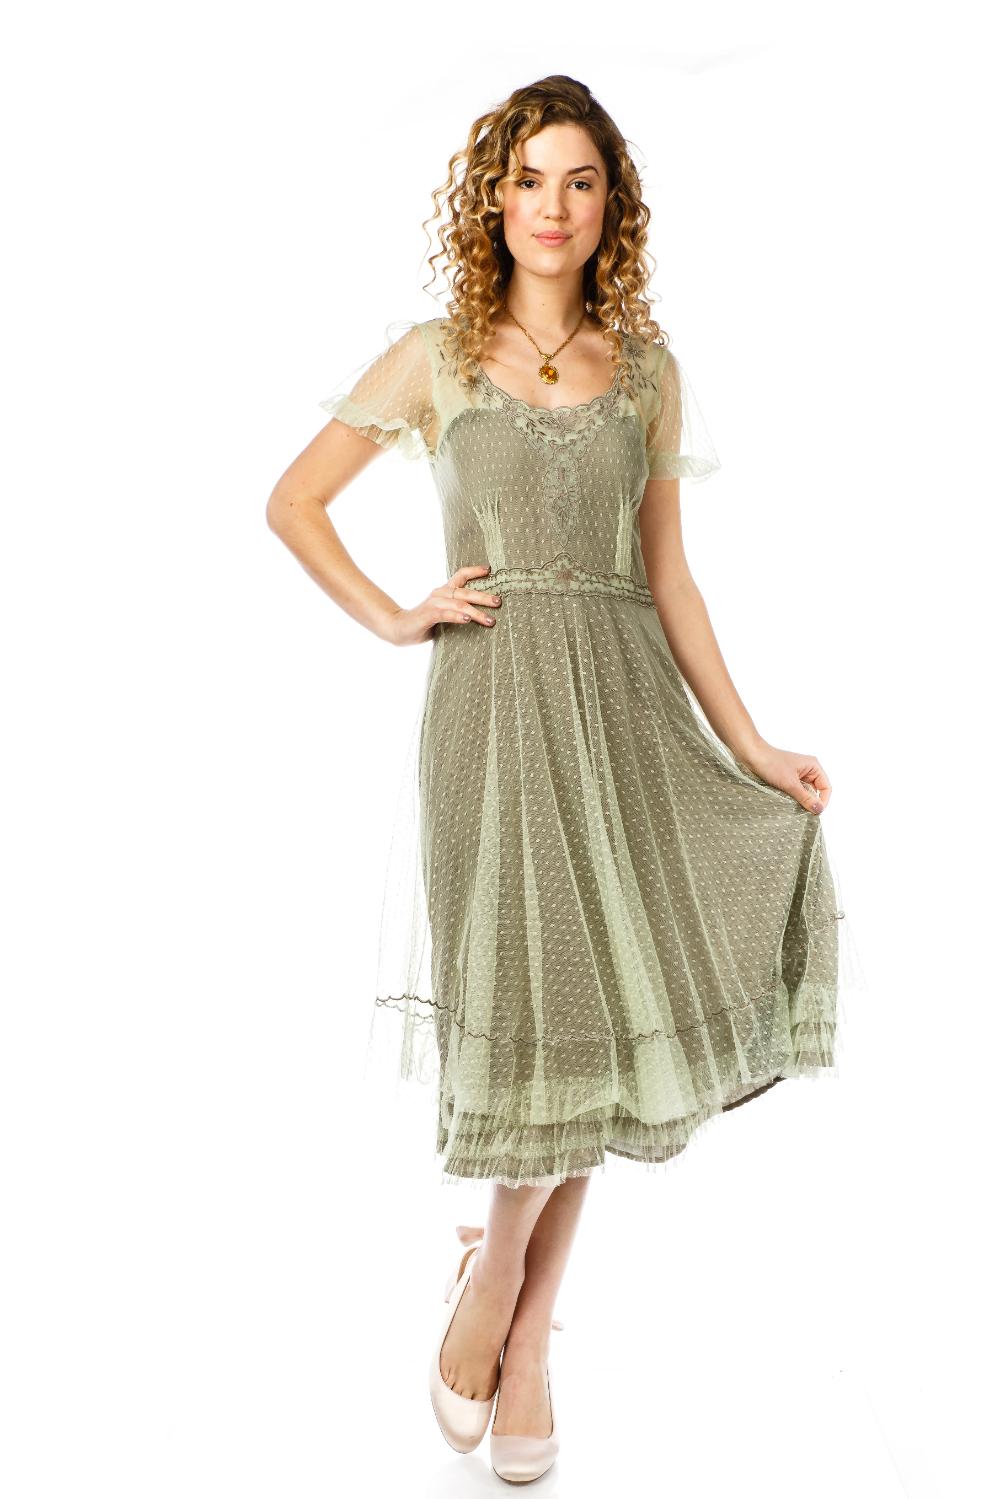 Roaring 20s Costumes Flapper Costumes Gangster Costumes Flapper Style Dresses Dresses Fashion Dresses [ 1499 x 1000 Pixel ]